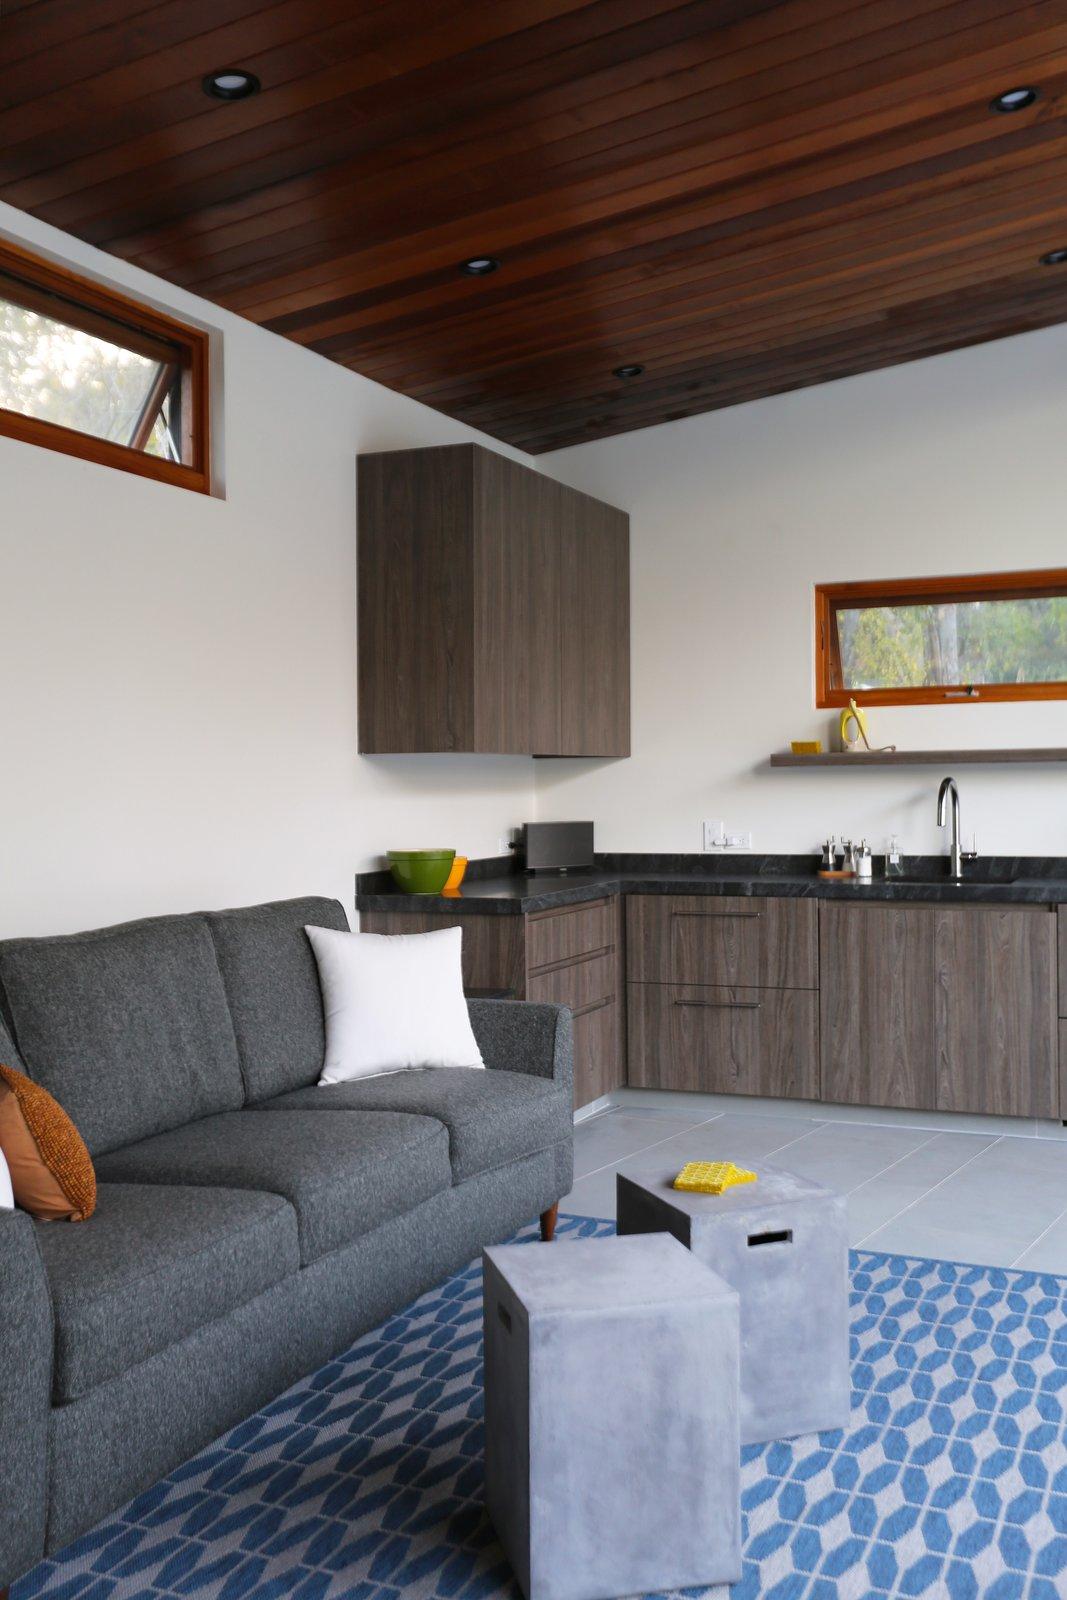 Pool House Living Room  Los Altos Hills Landscape by Greenblott Design